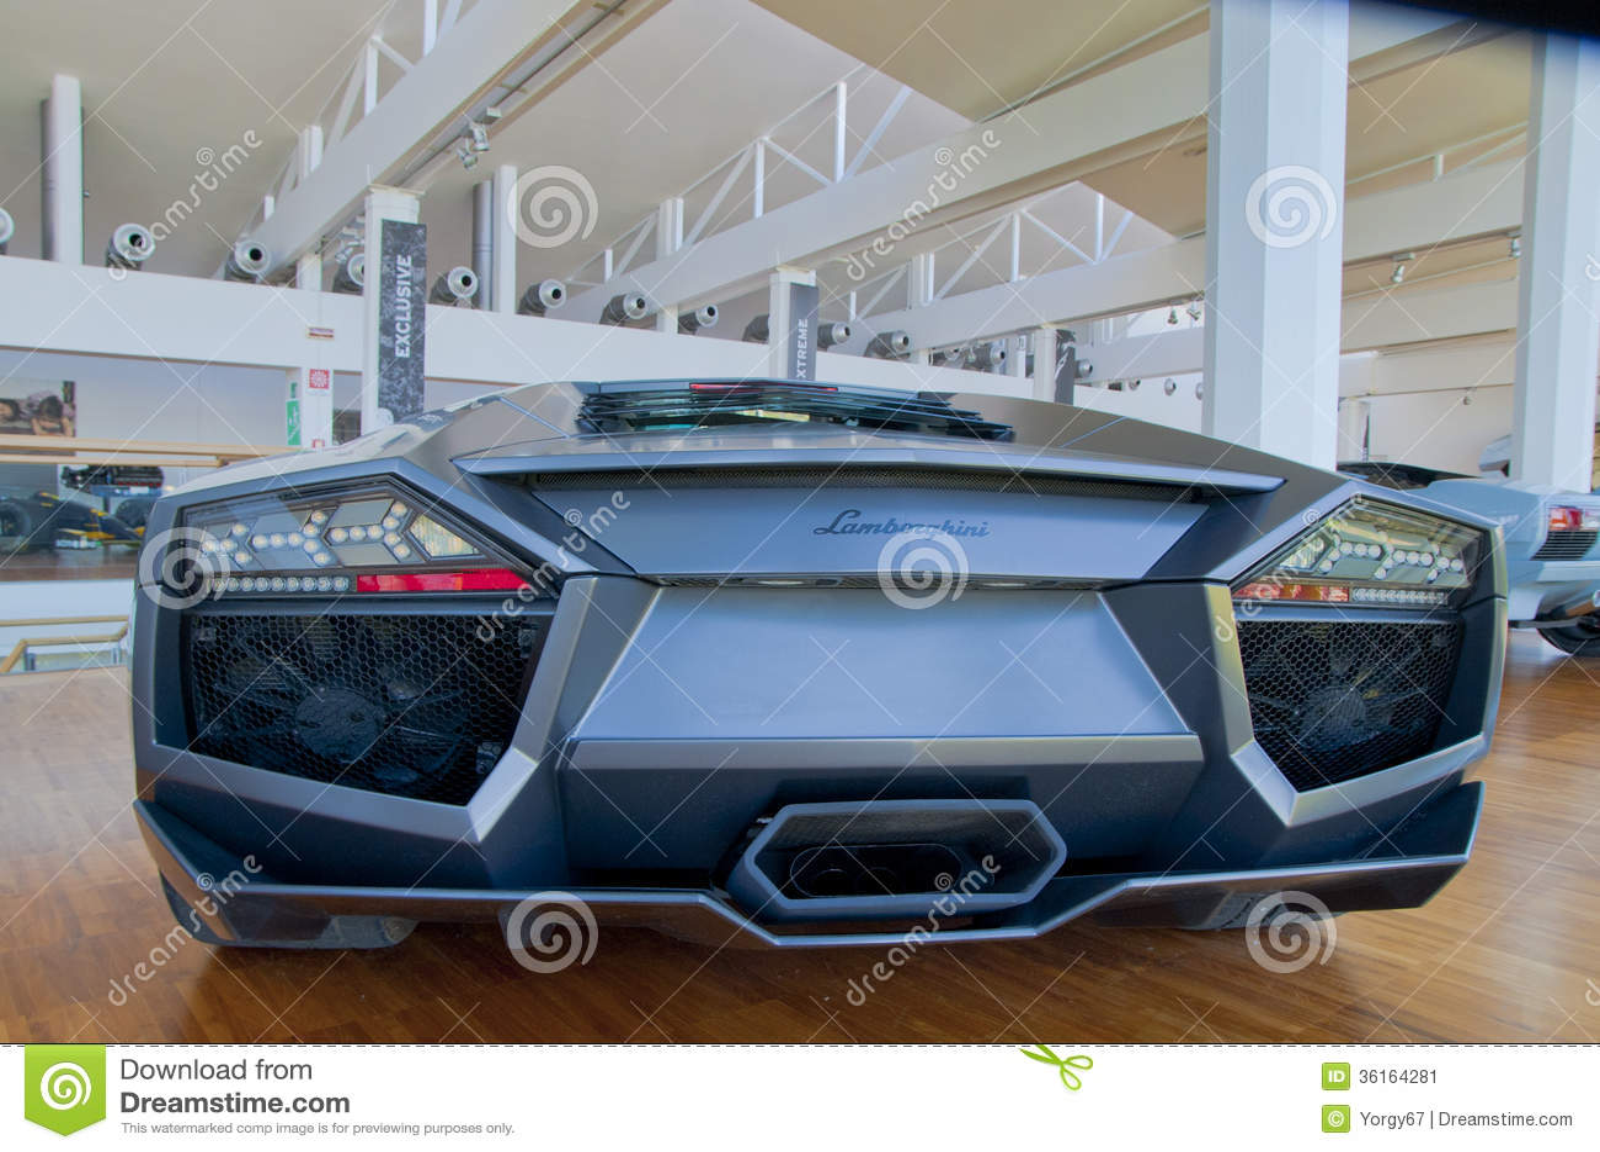 Back View Of Lamborghini Car Editorial Photo Image Of Luxury Back